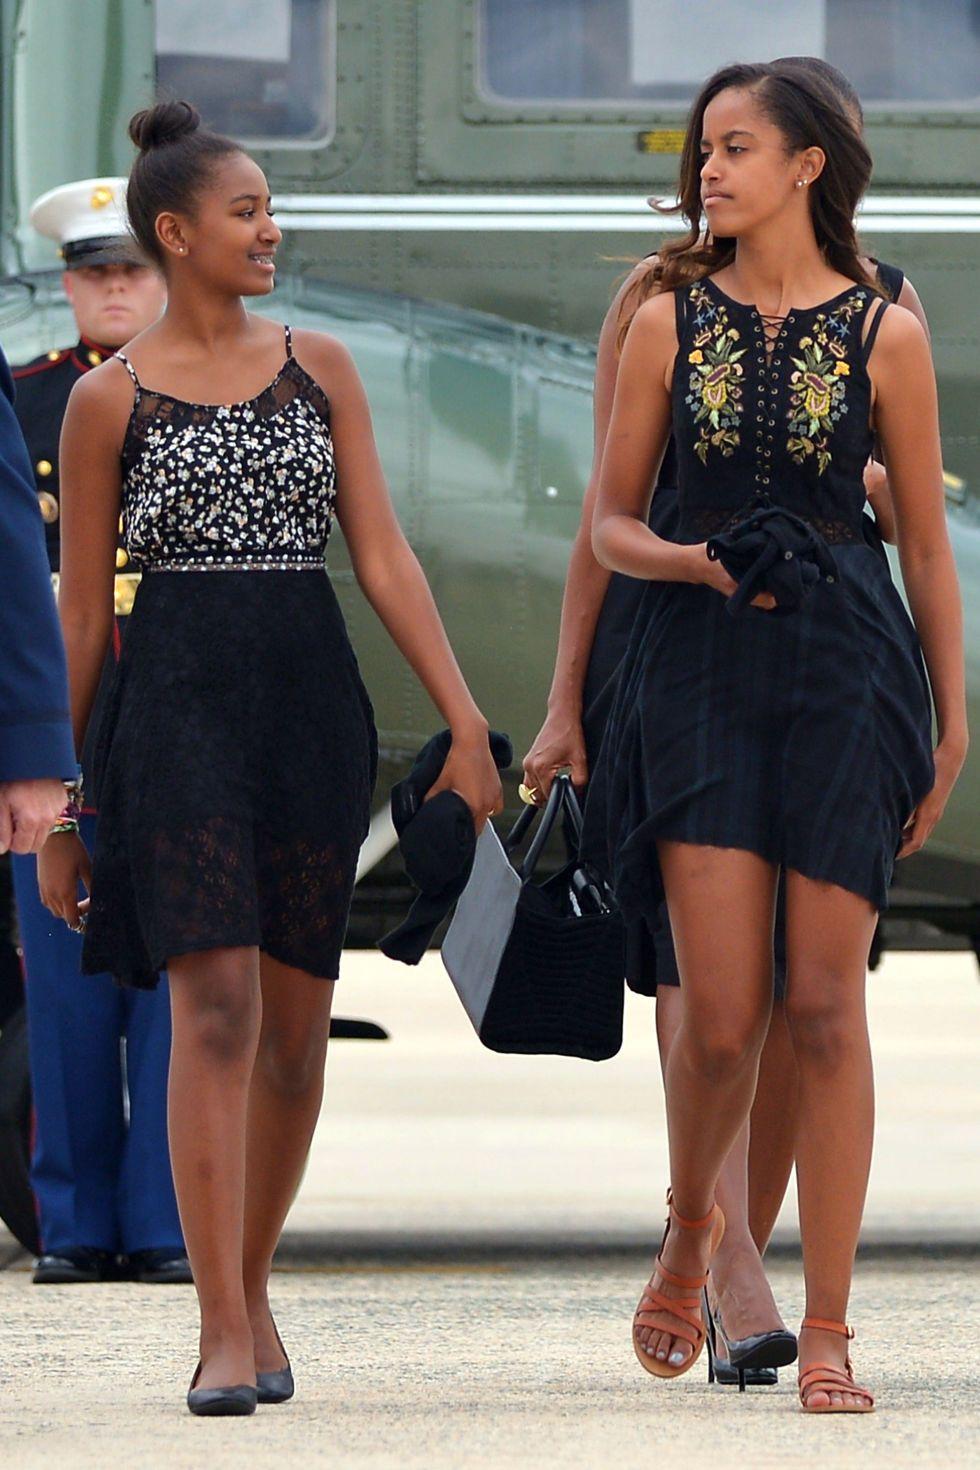 Sasha and Malia Obama Look Spring Chic In Cuba | Malia obama, Sasha obama  style, Malia and sasha